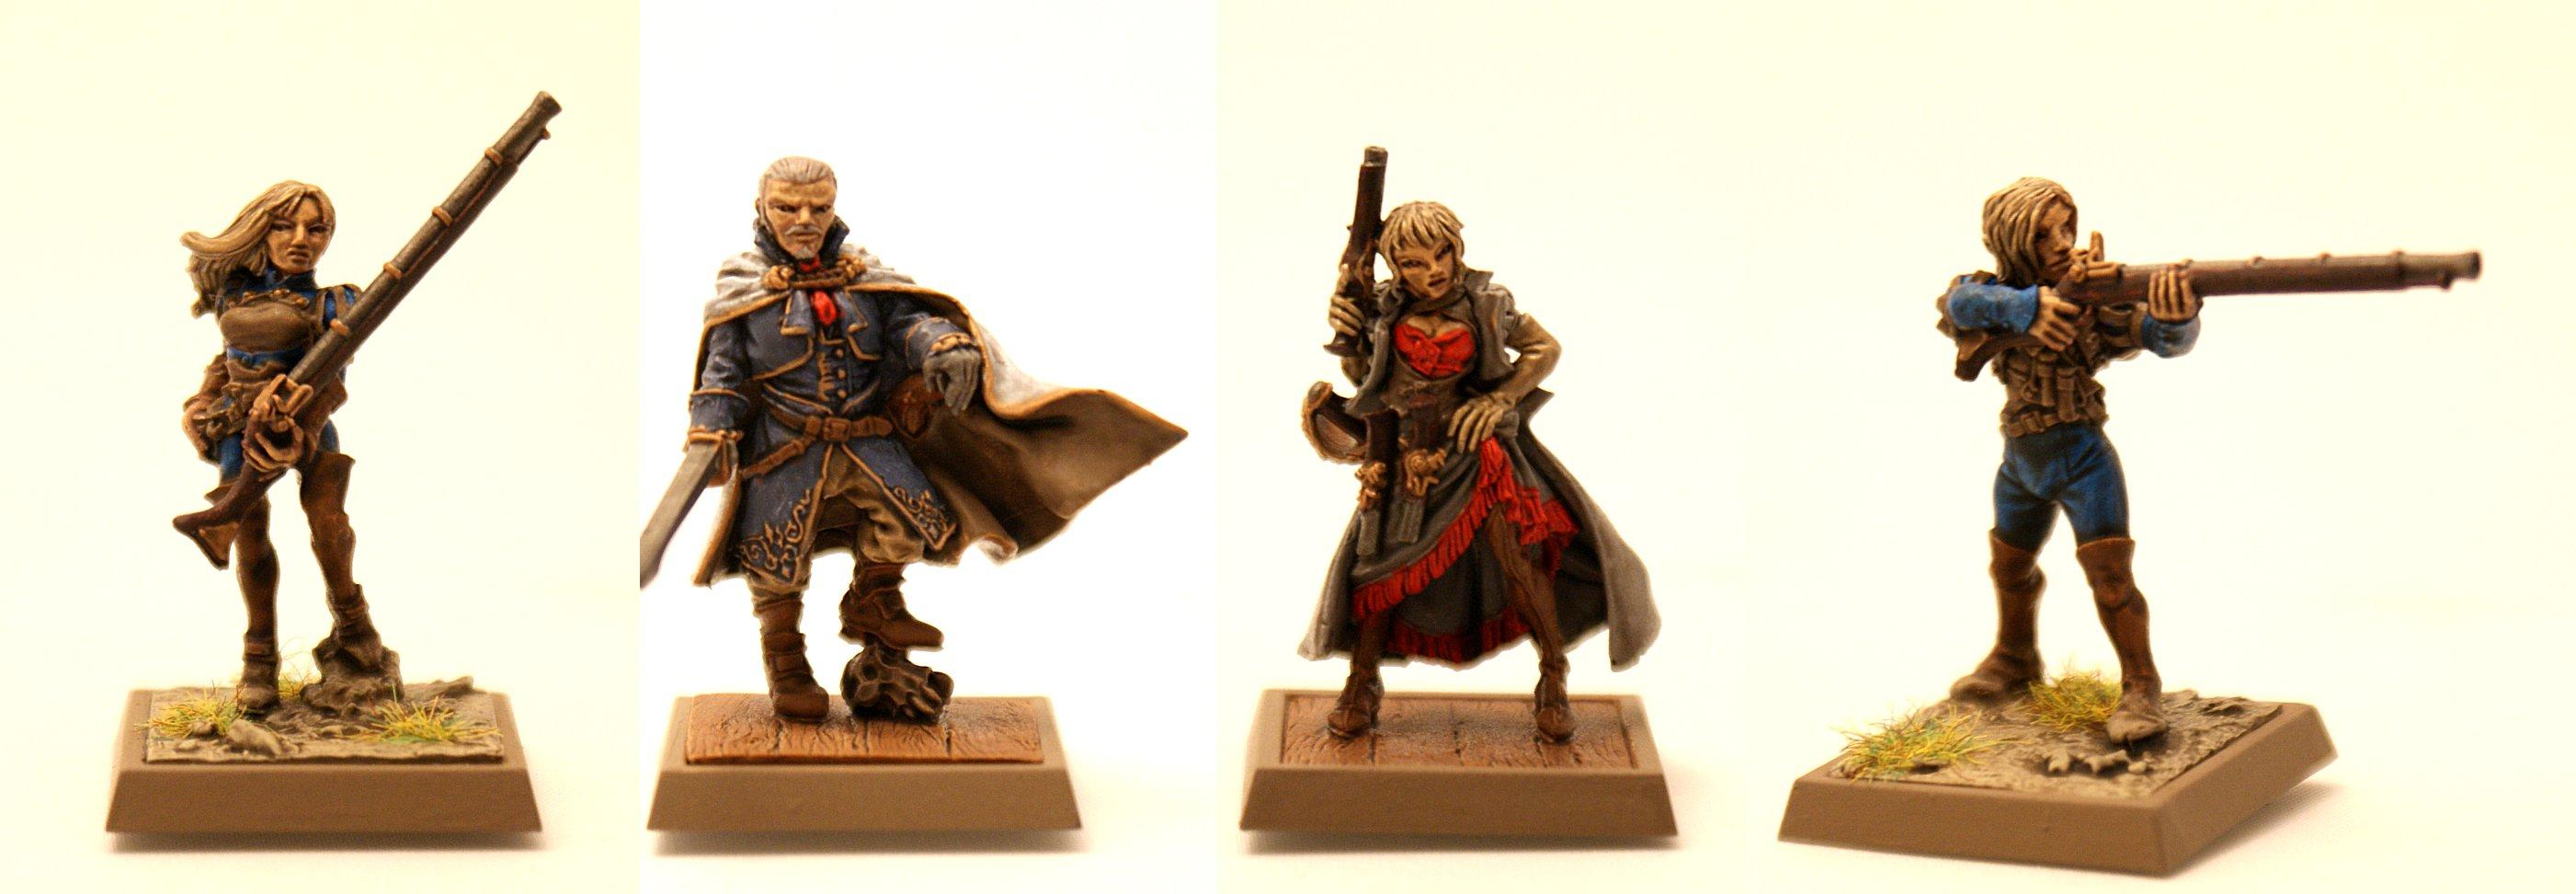 Armada, Fate, Freebooter, Imperial, Miniatures, Pirates